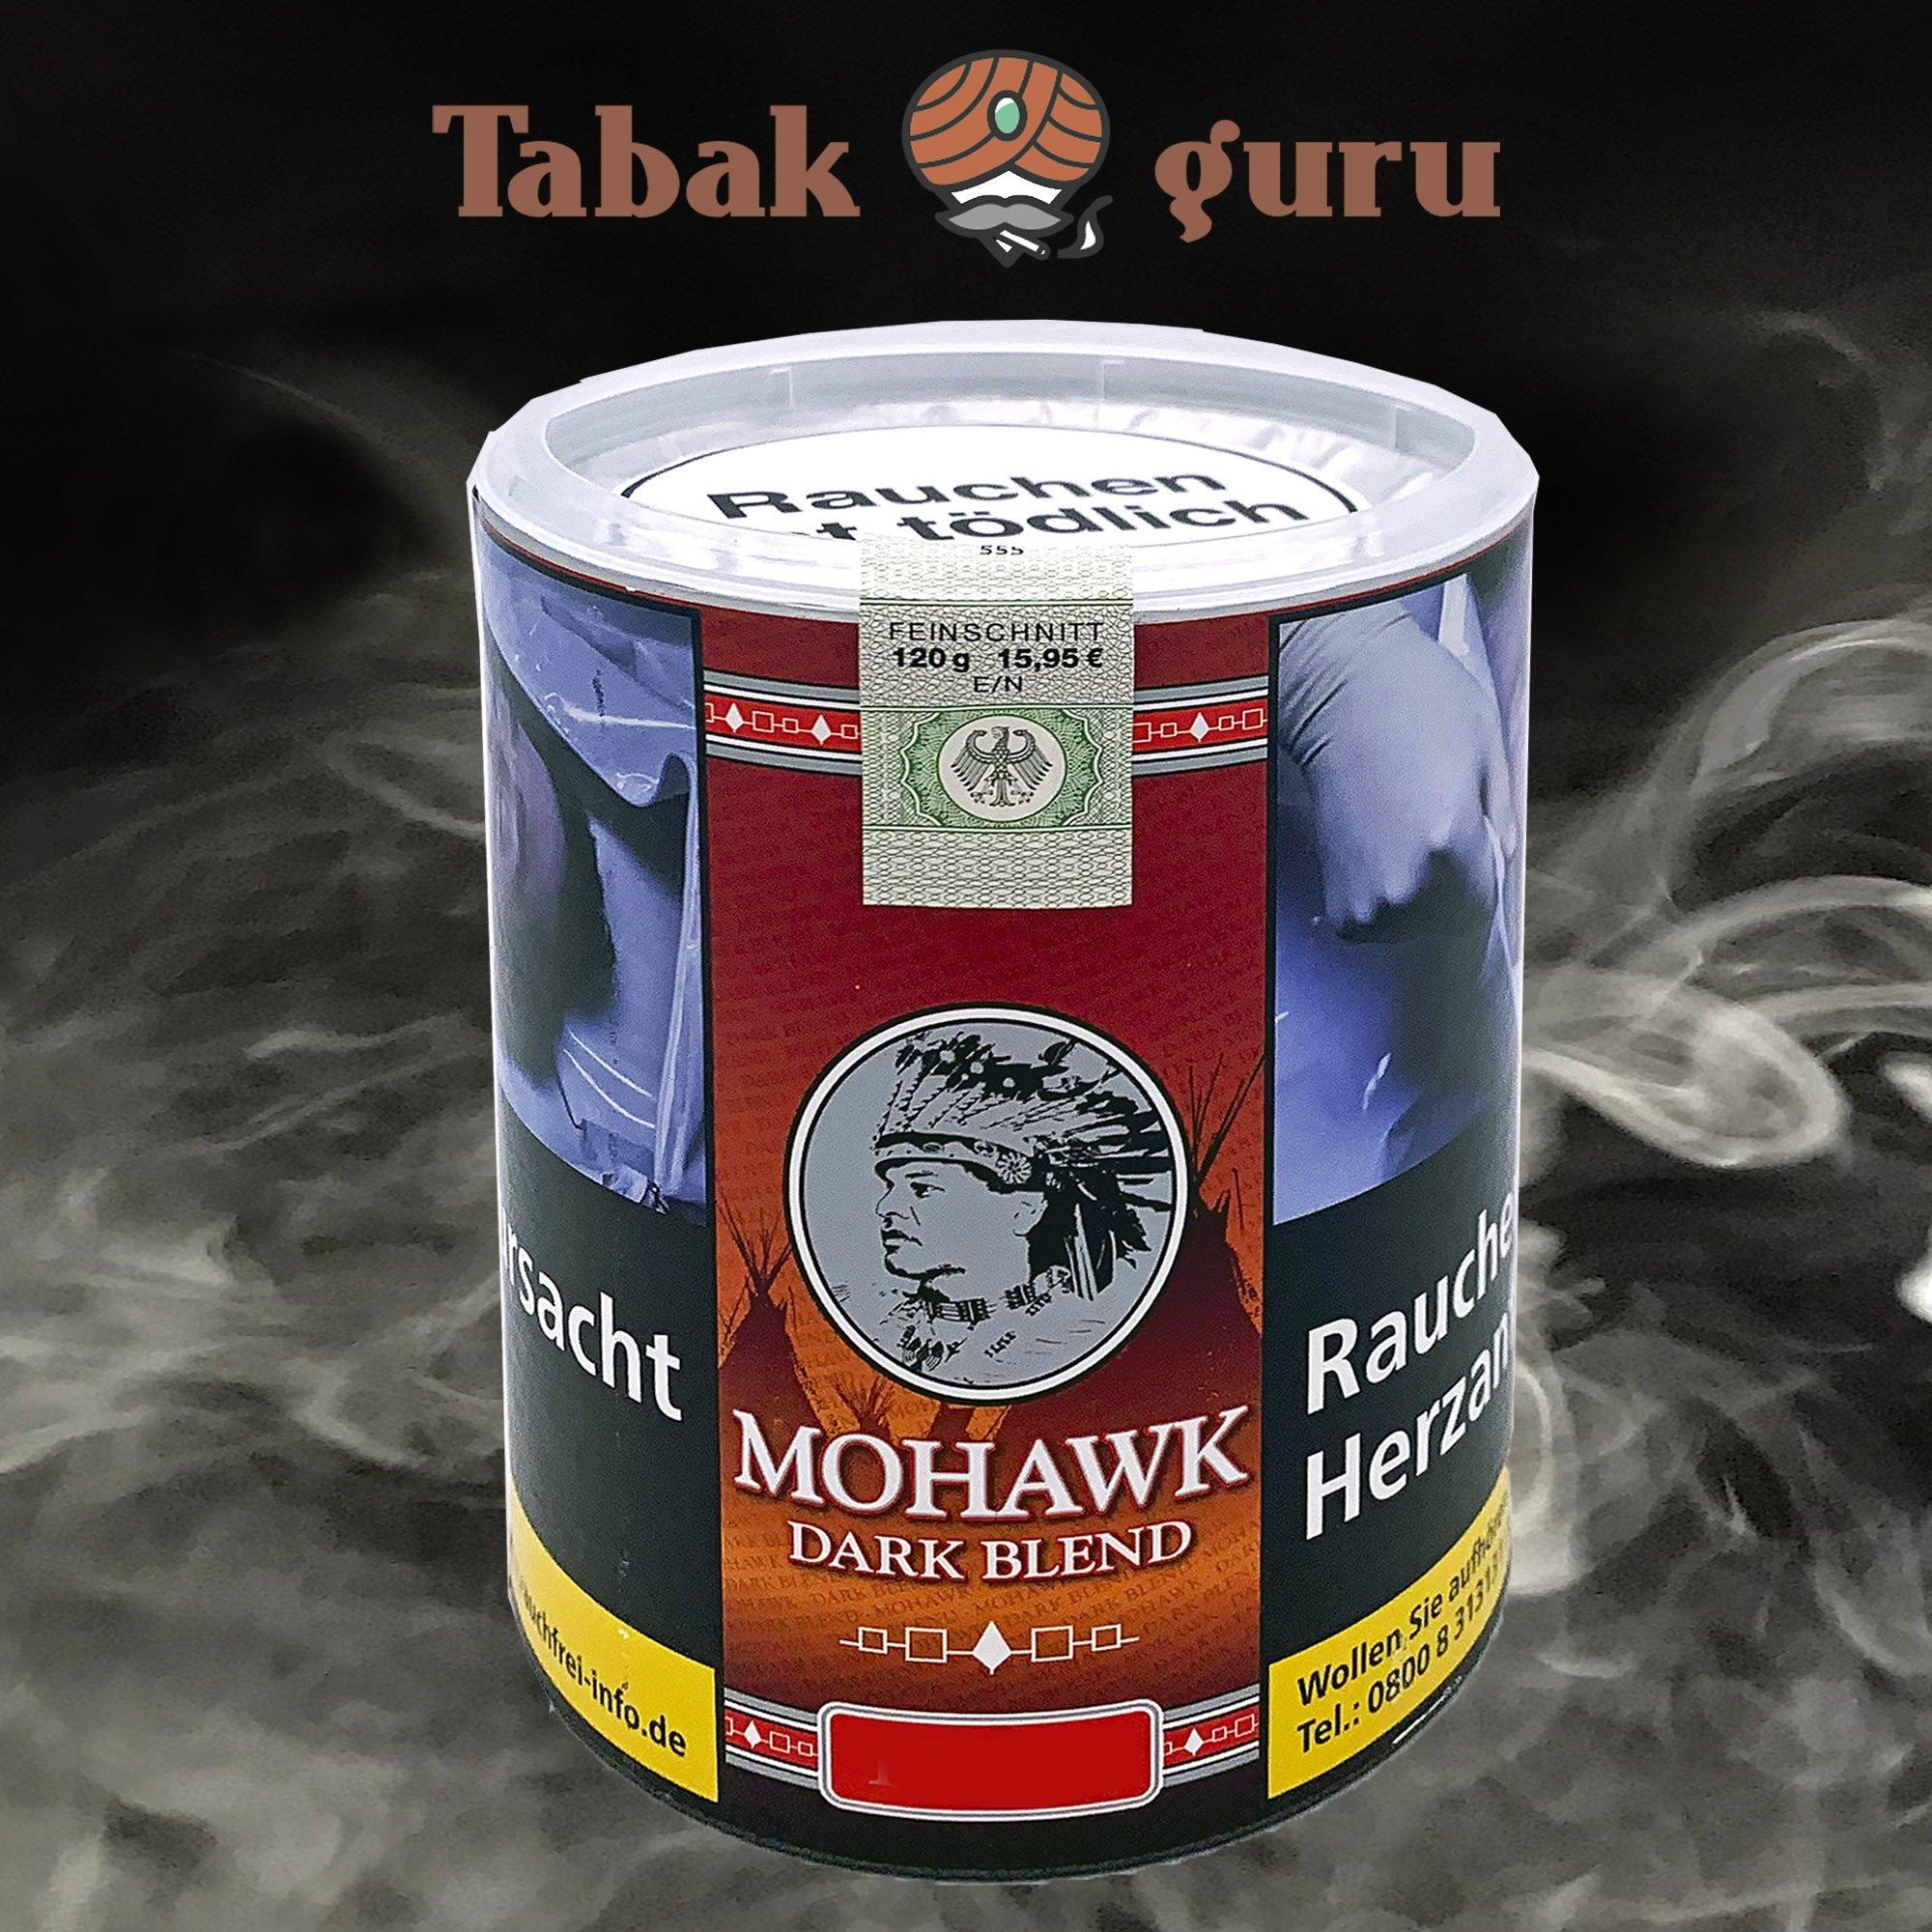 Mohawk Dark Blend Feinschnitt-Tabak